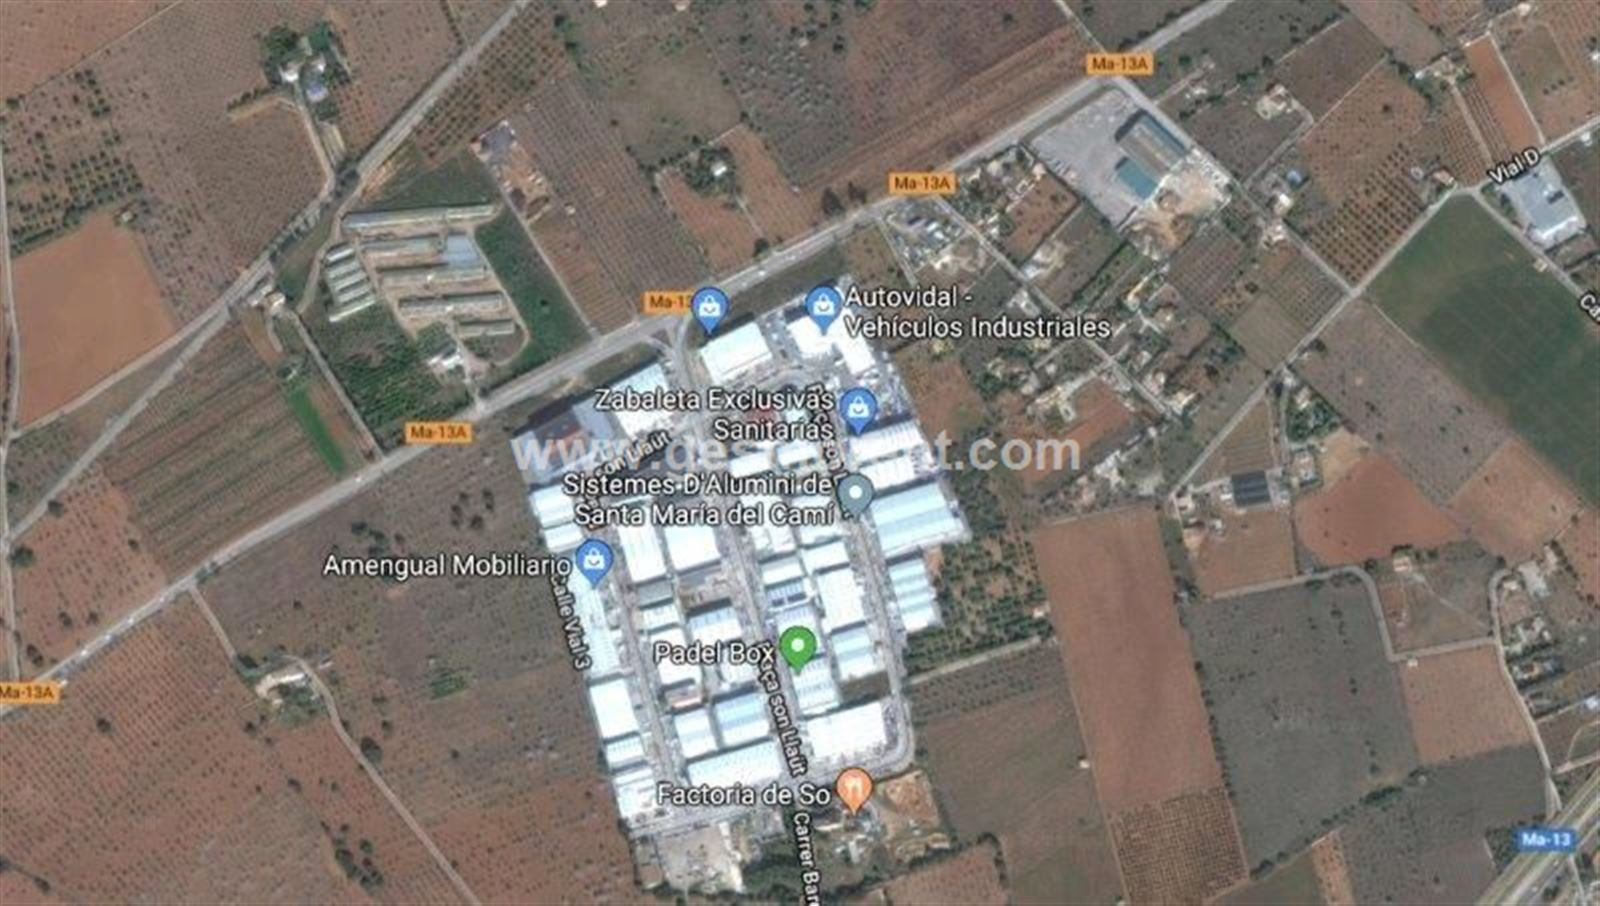 Bâtiment à usage industriel  Santa maria - poligono son llaut. Nave de 250m2 aprox. en polígono son llaüt